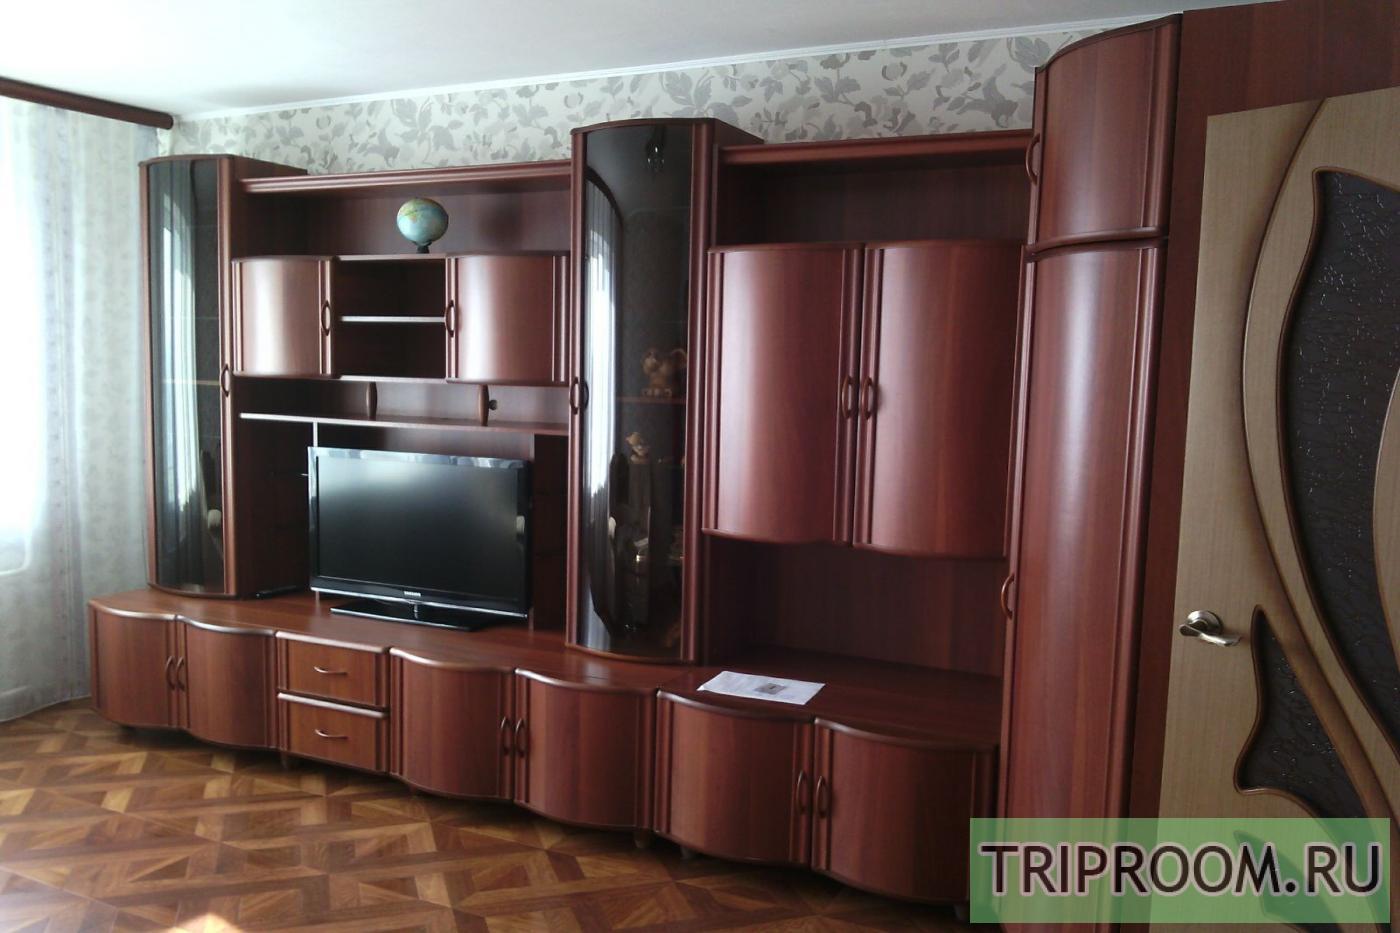 2-комнатная квартира посуточно (вариант № 33661), ул. Морозова Павла Леонтьевича, фото № 7